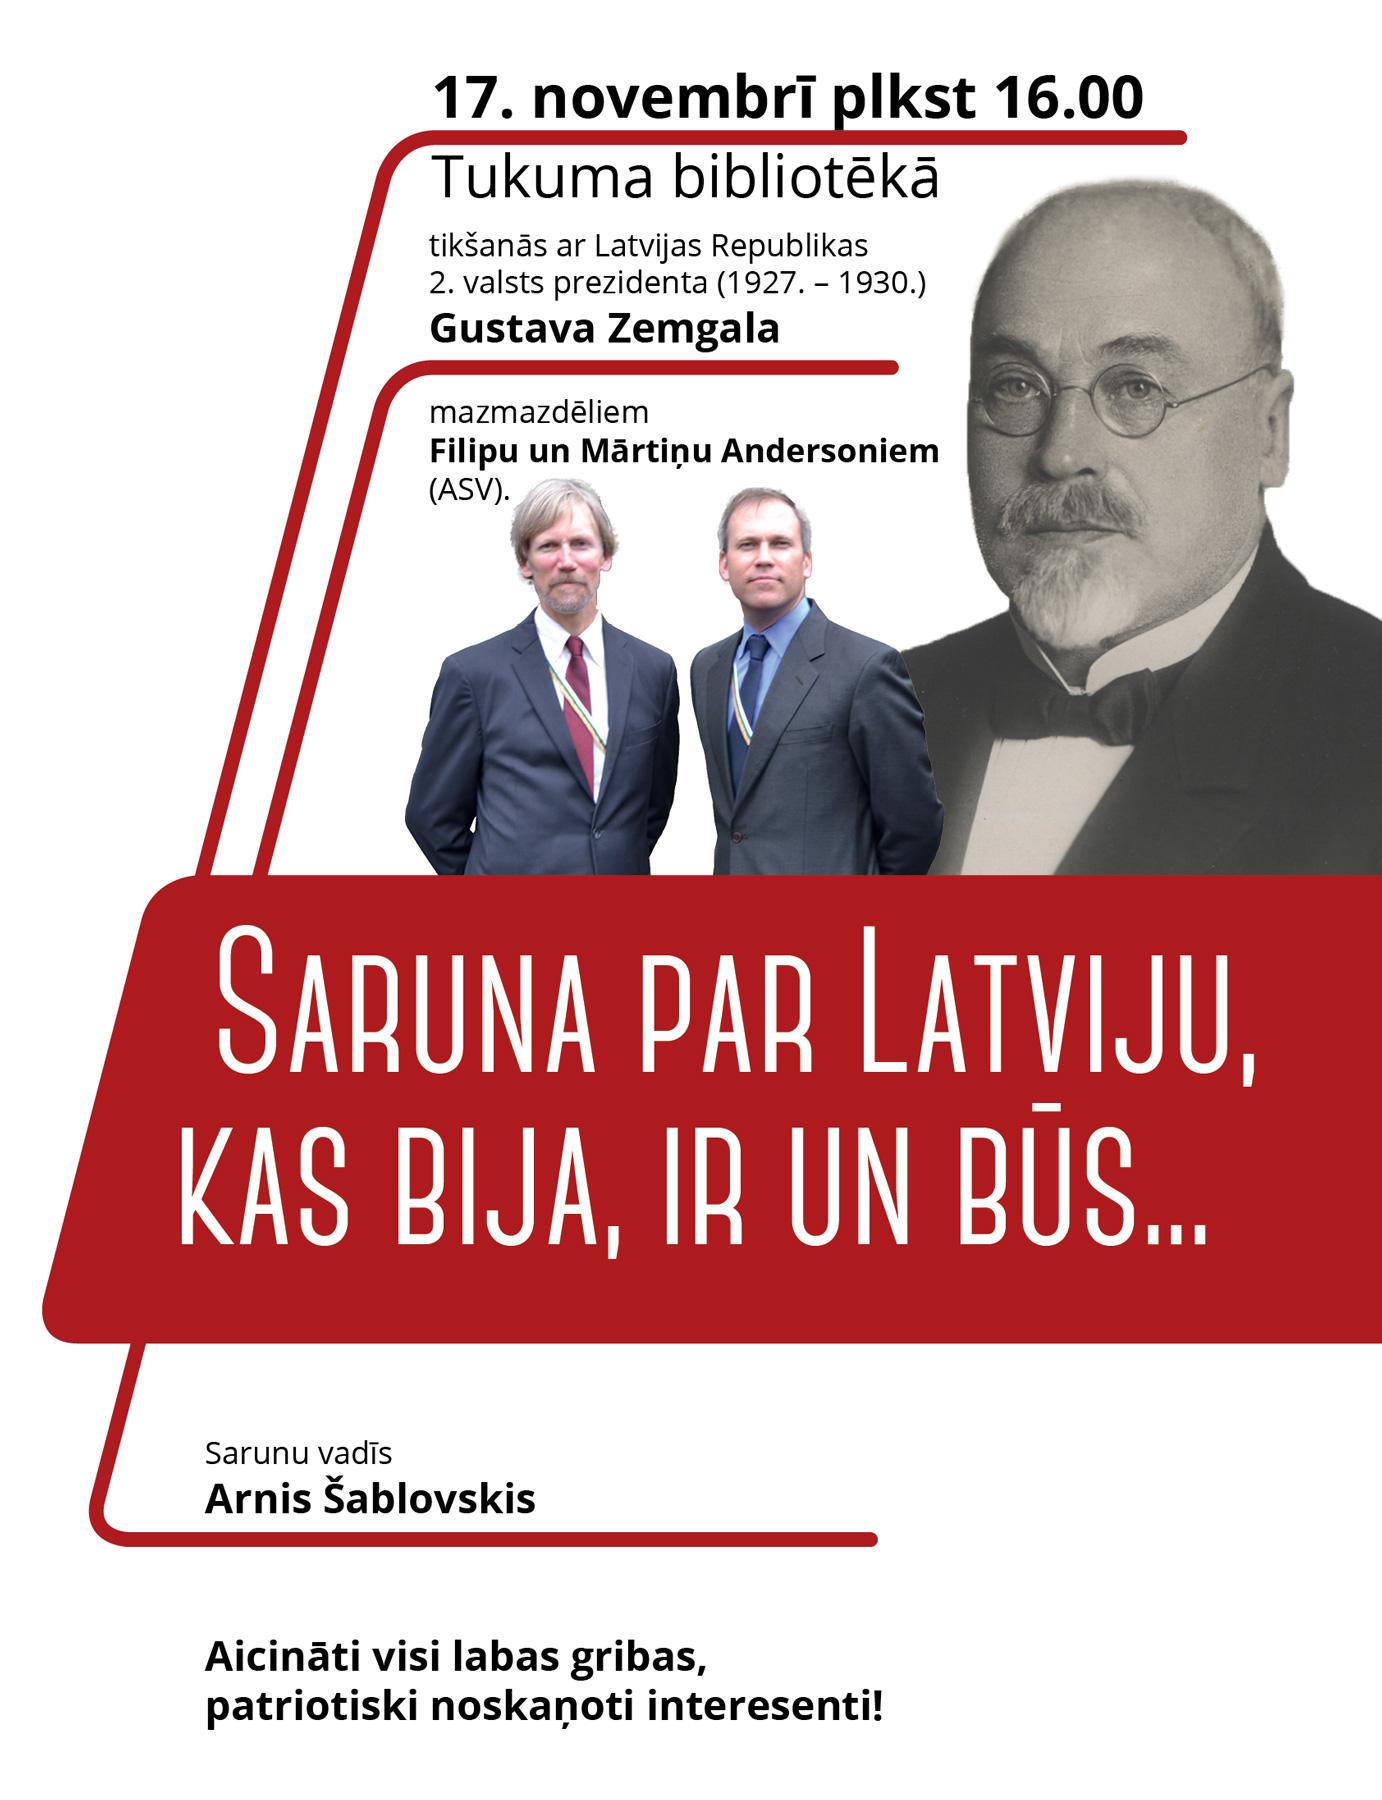 Tiksanas-Zemgala-mazmazdeliem-Plakats